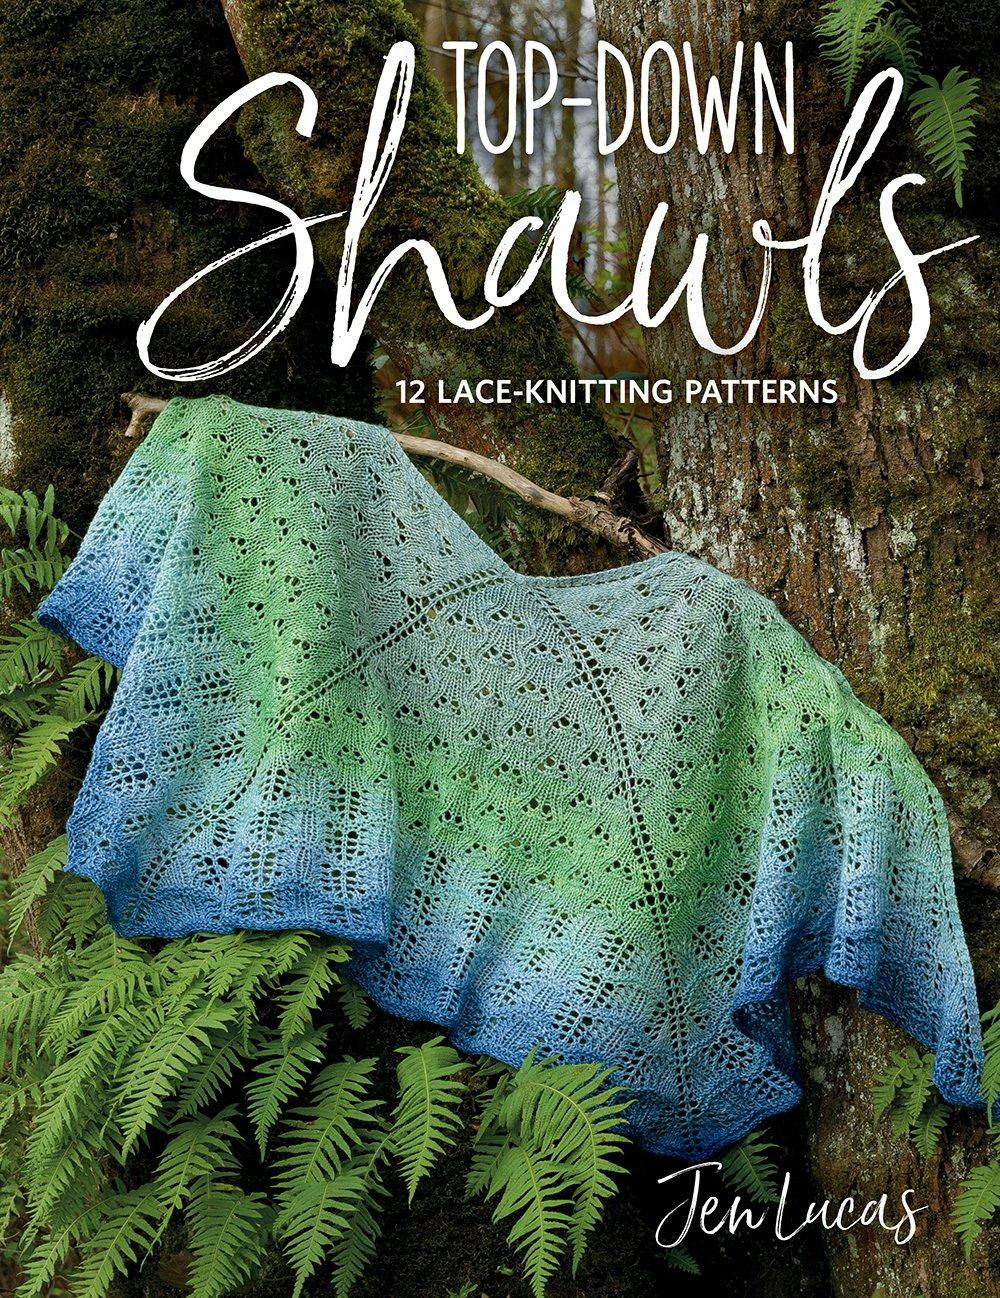 Top-Down Shawls: 12 Lace-Knitting Patterns Paperback – November 15, 2018 Jen Lucas Martingale 1604689609 Knitting; Patterns.